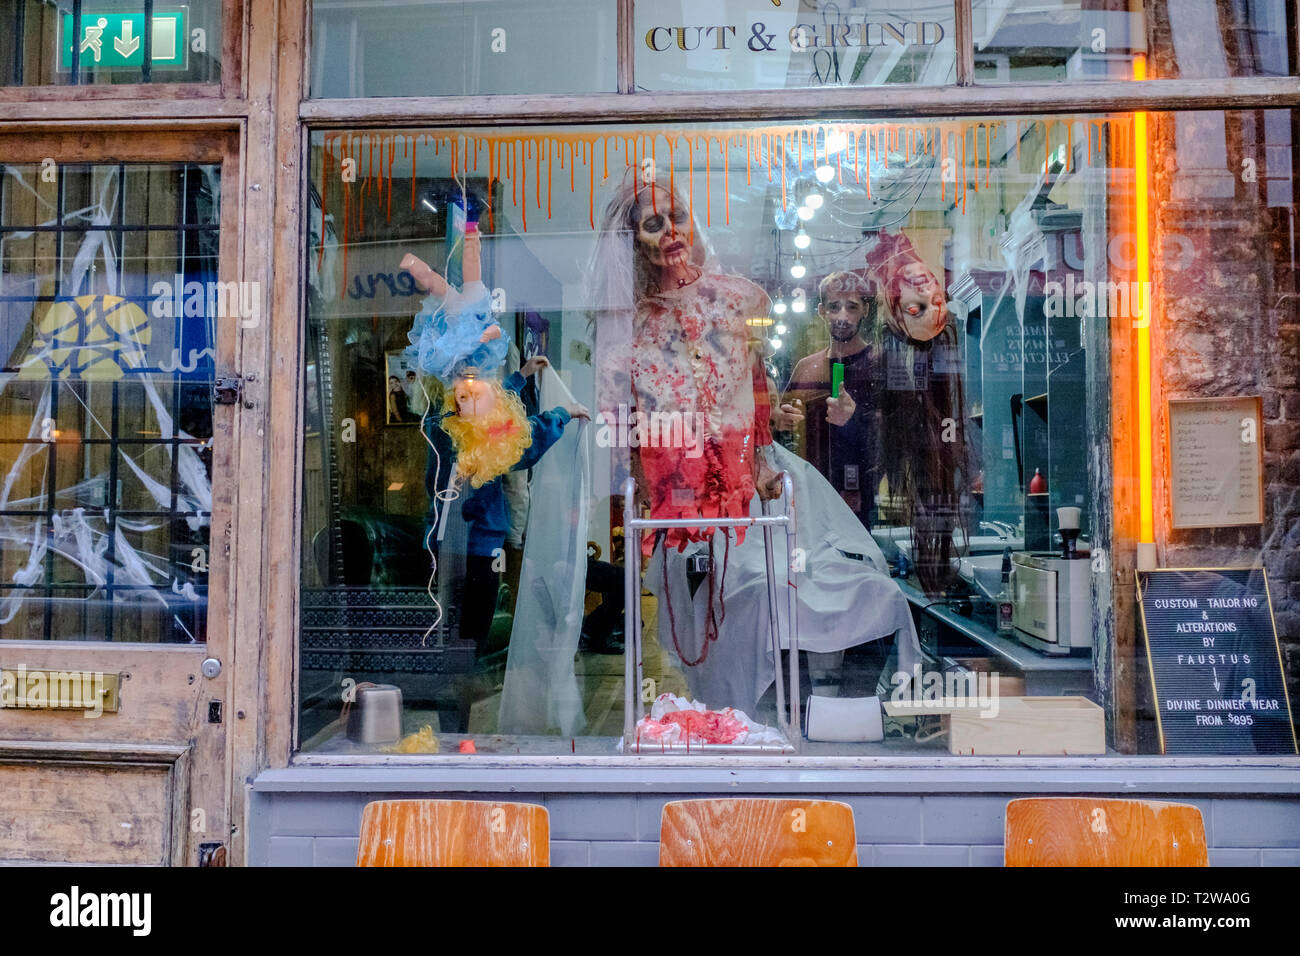 Halloween Shop Displays.Barber Shop Gory Halloween Window Display Stock Photo 242731120 Alamy